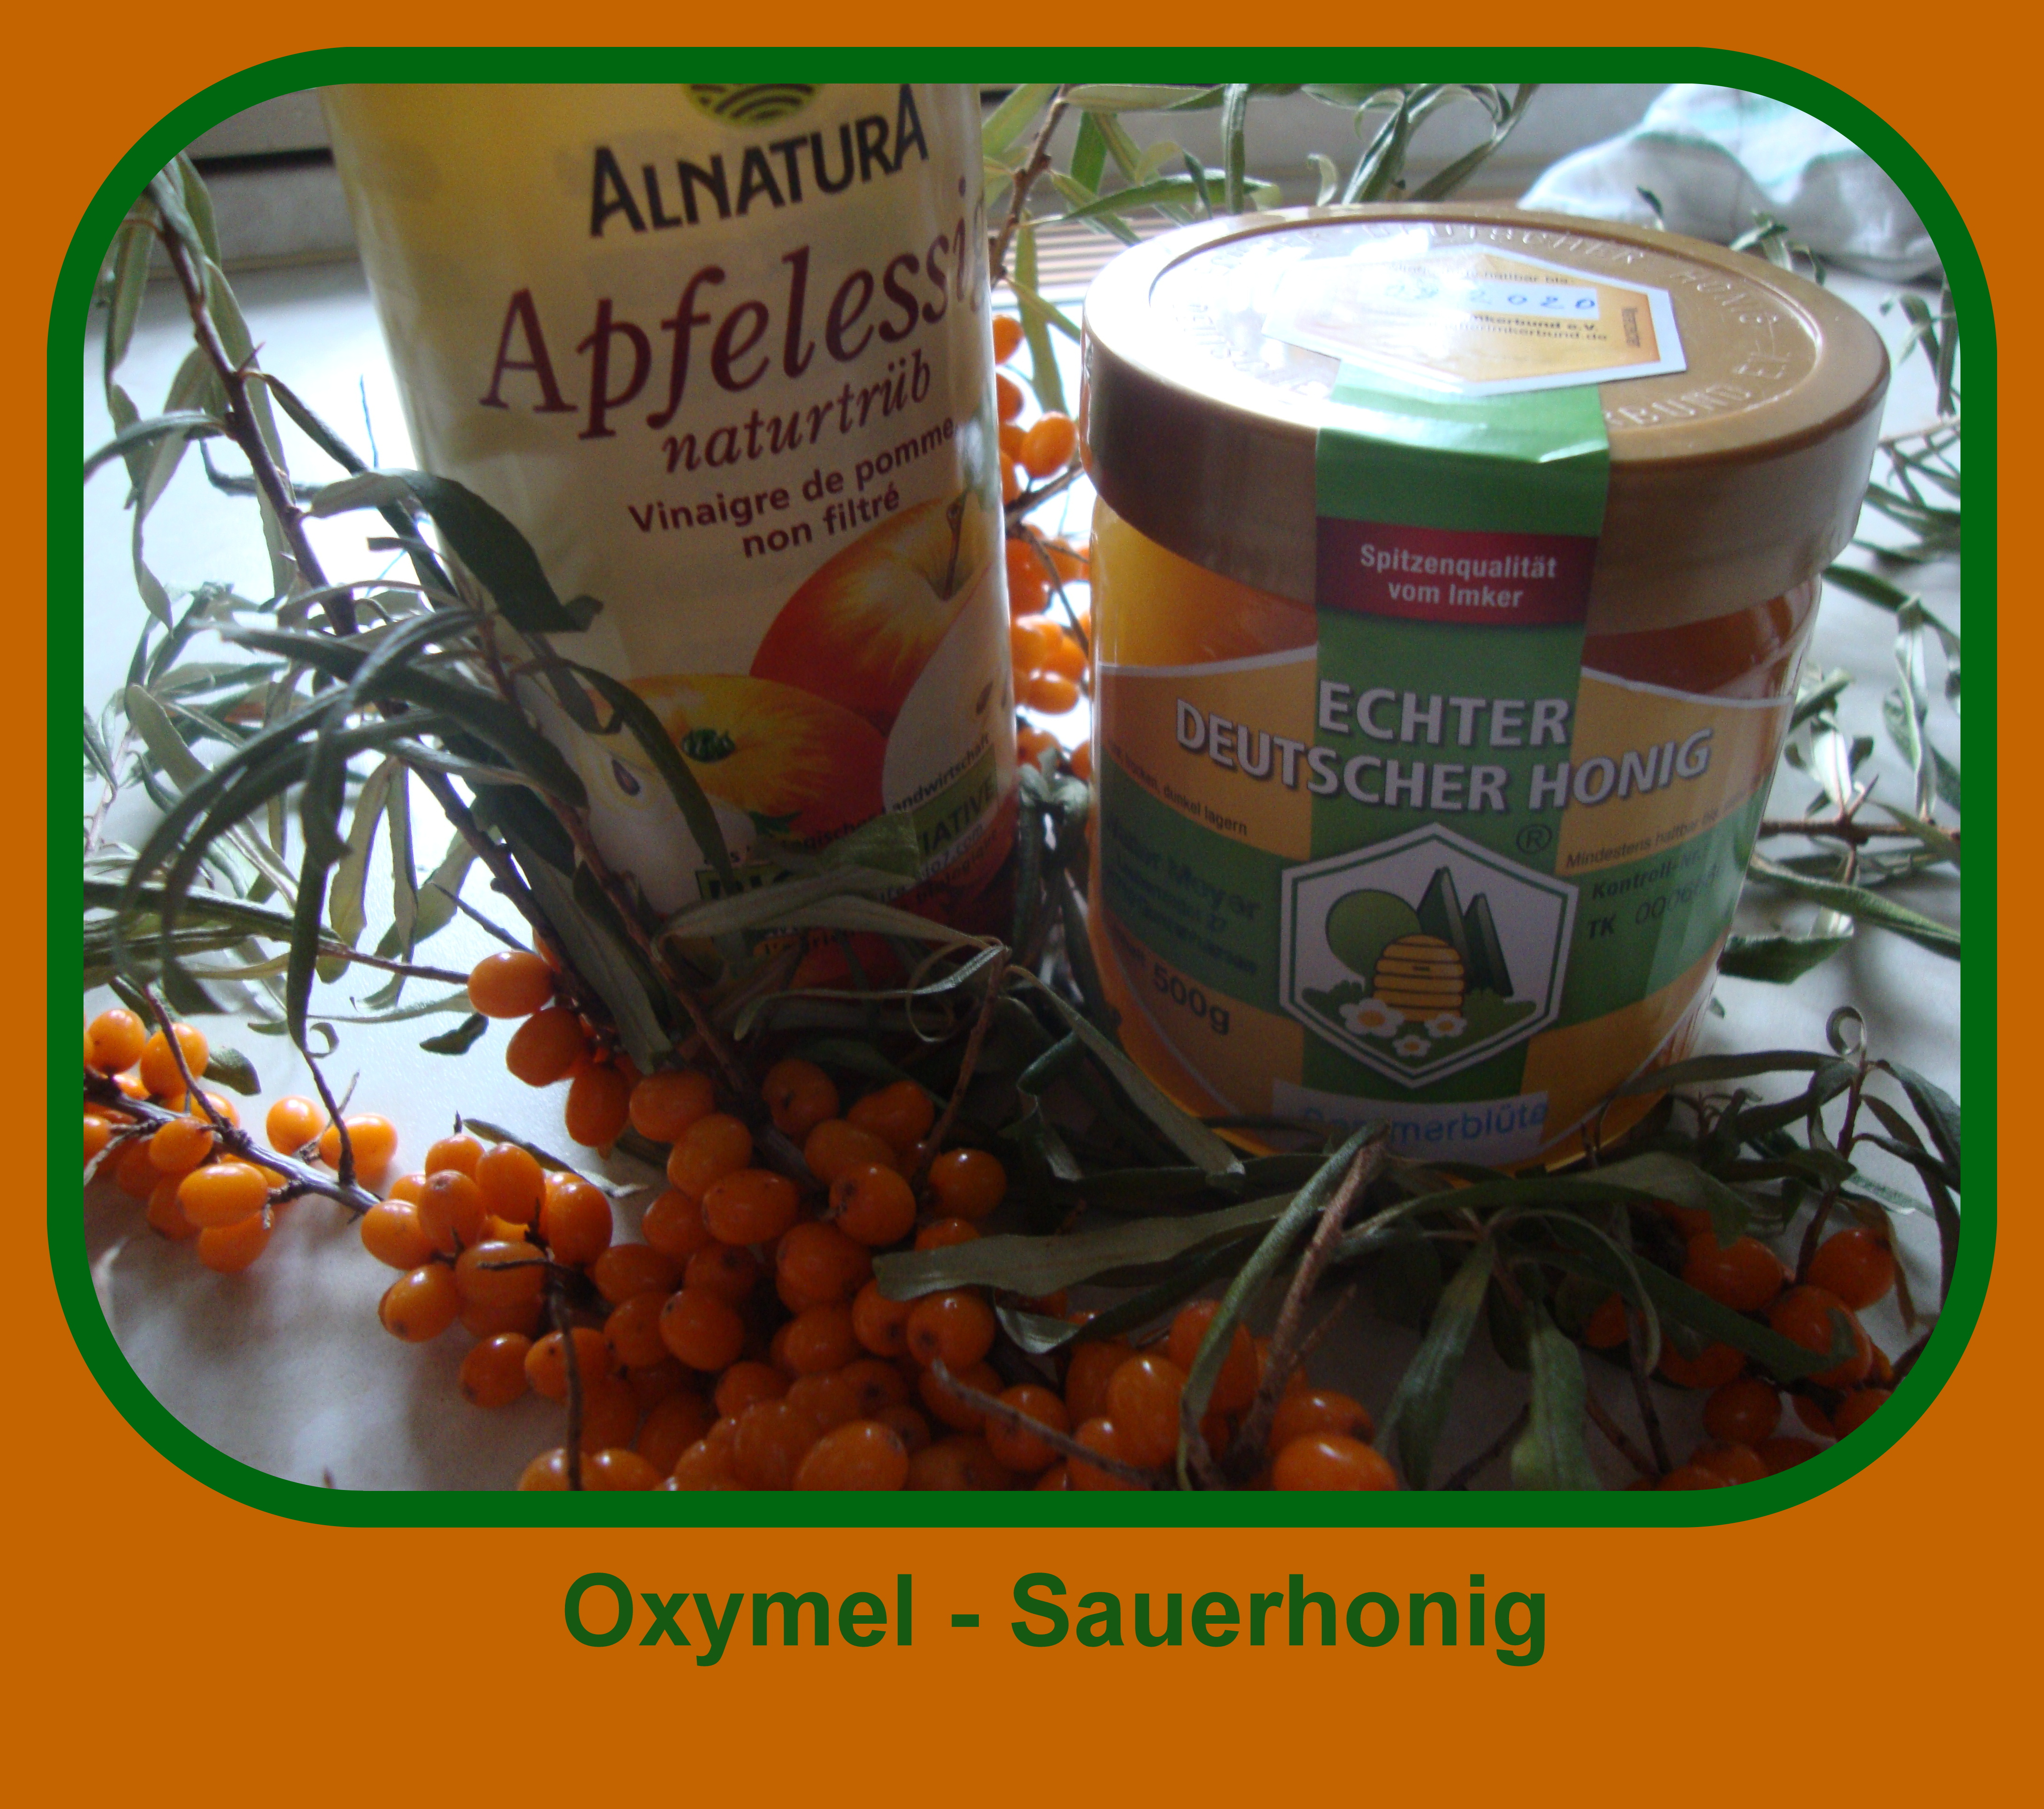 Oxymel – das alte Hausmittel »Sauerhonig« neu entdeckt (25. Oktober)